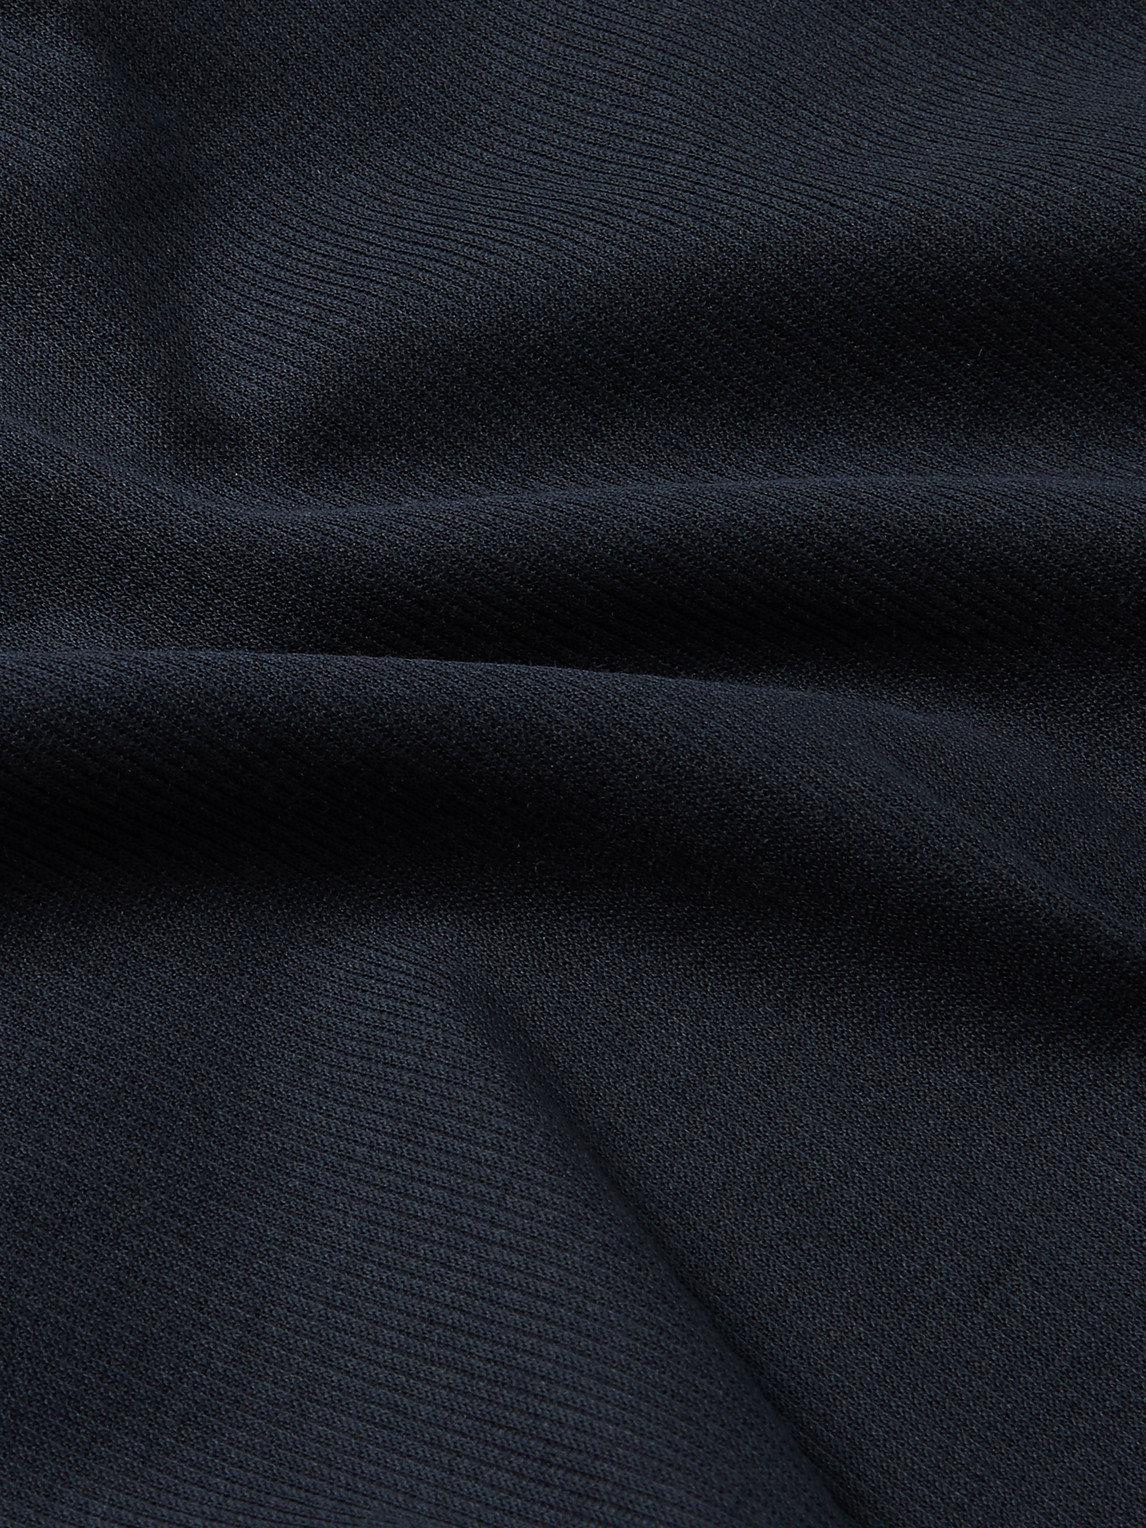 SCHIESSER Cottons KARL HEINZ SLIM-FIT RIBBED COTTON-JERSEY HENLEY PYJAMA T-SHIRT